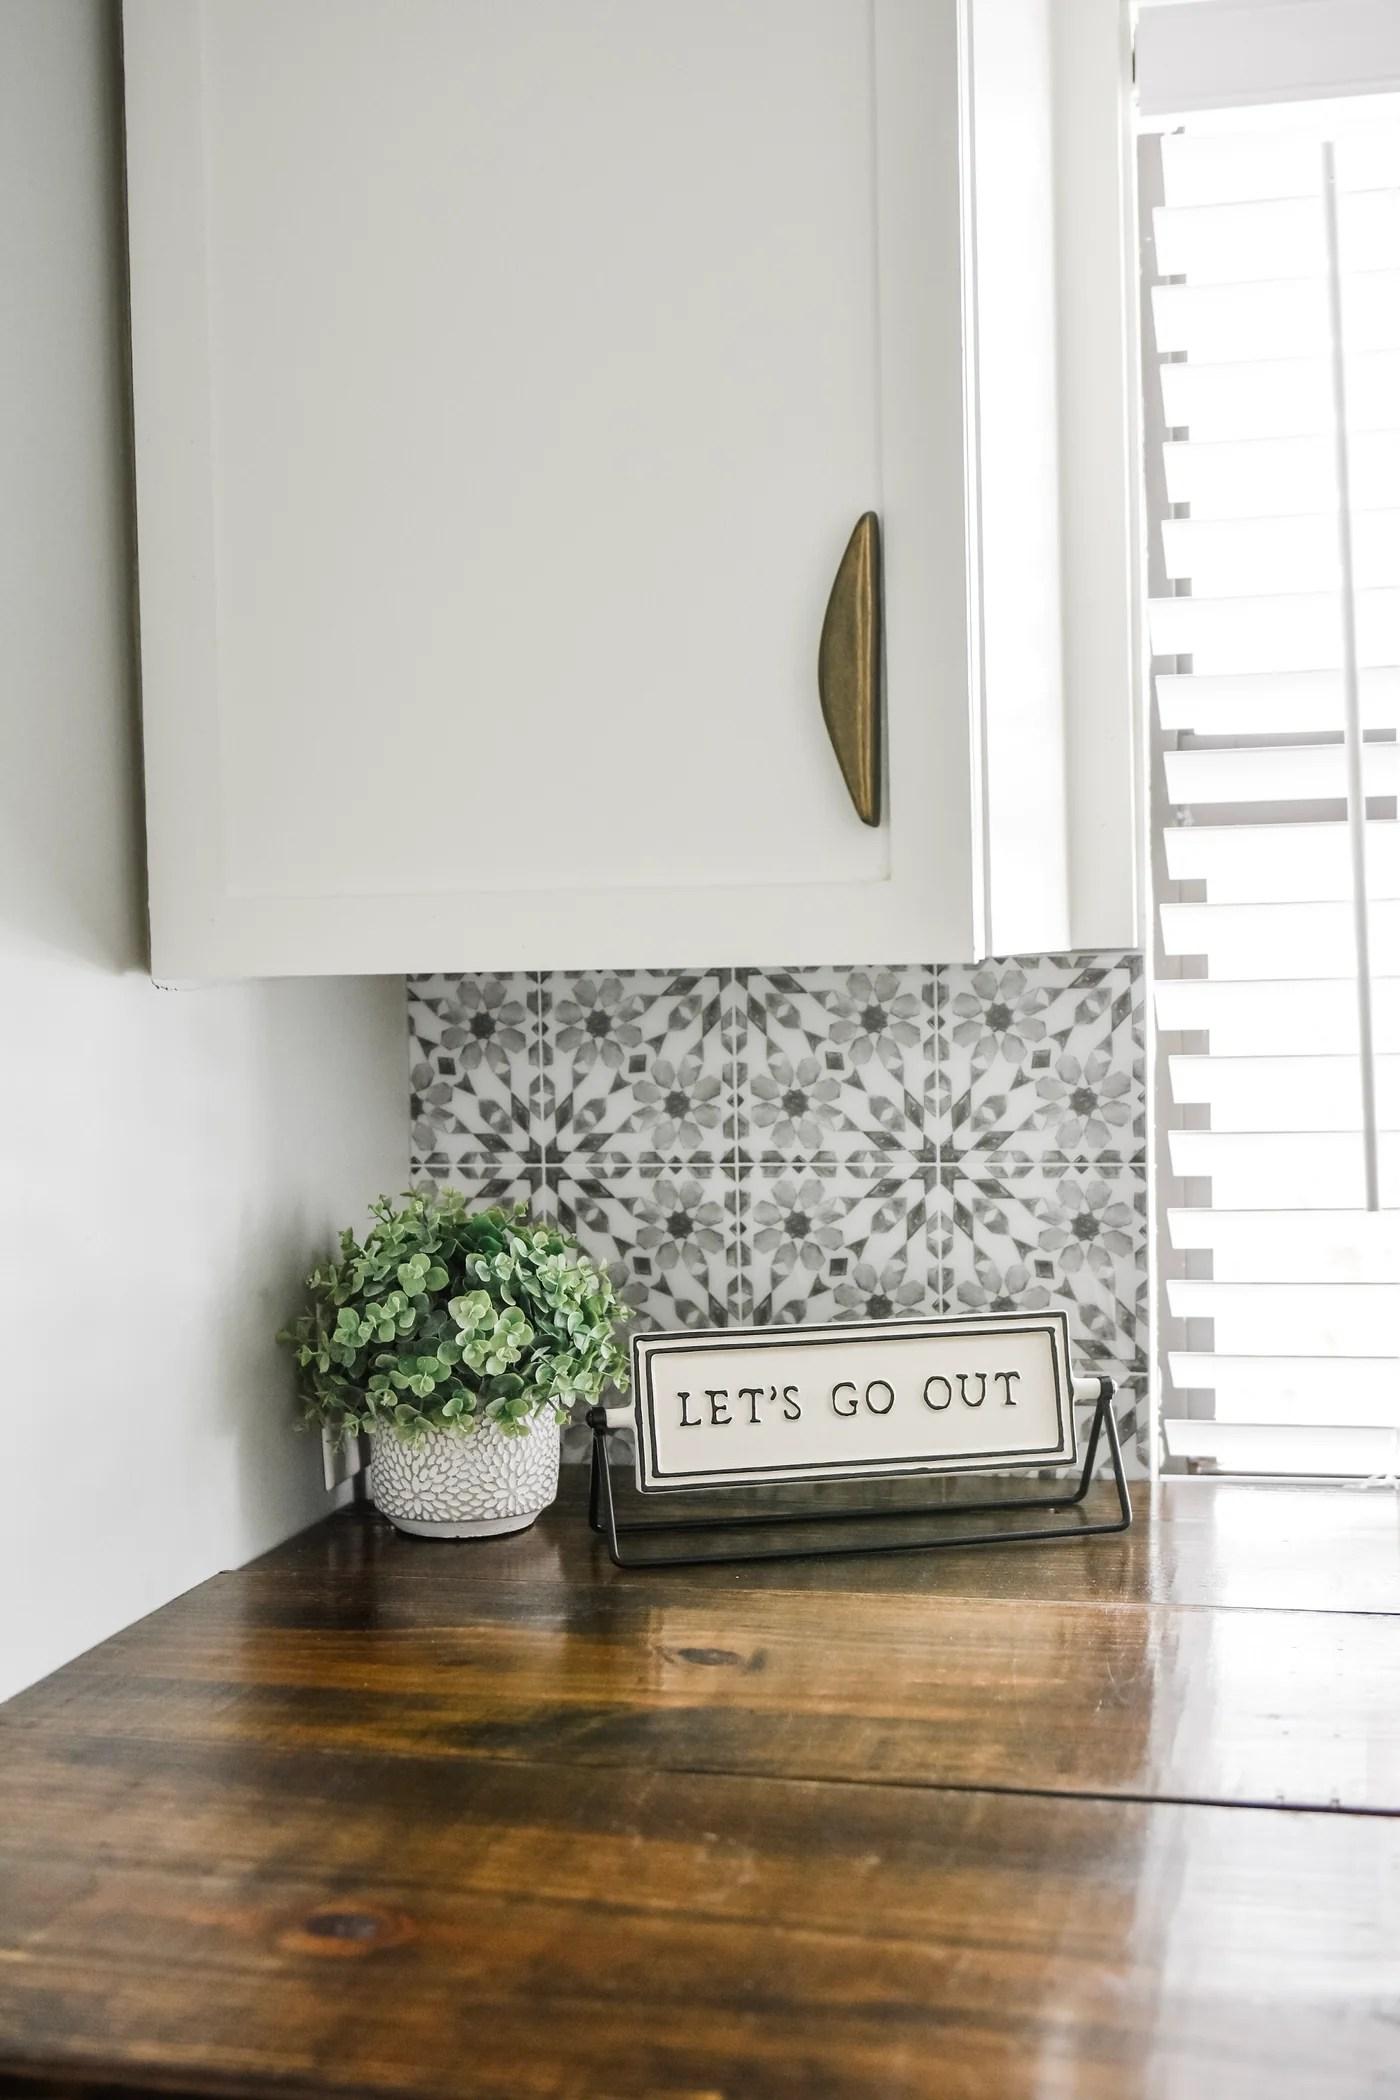 wallpops catalan gray and white peel and stick backsplash tile